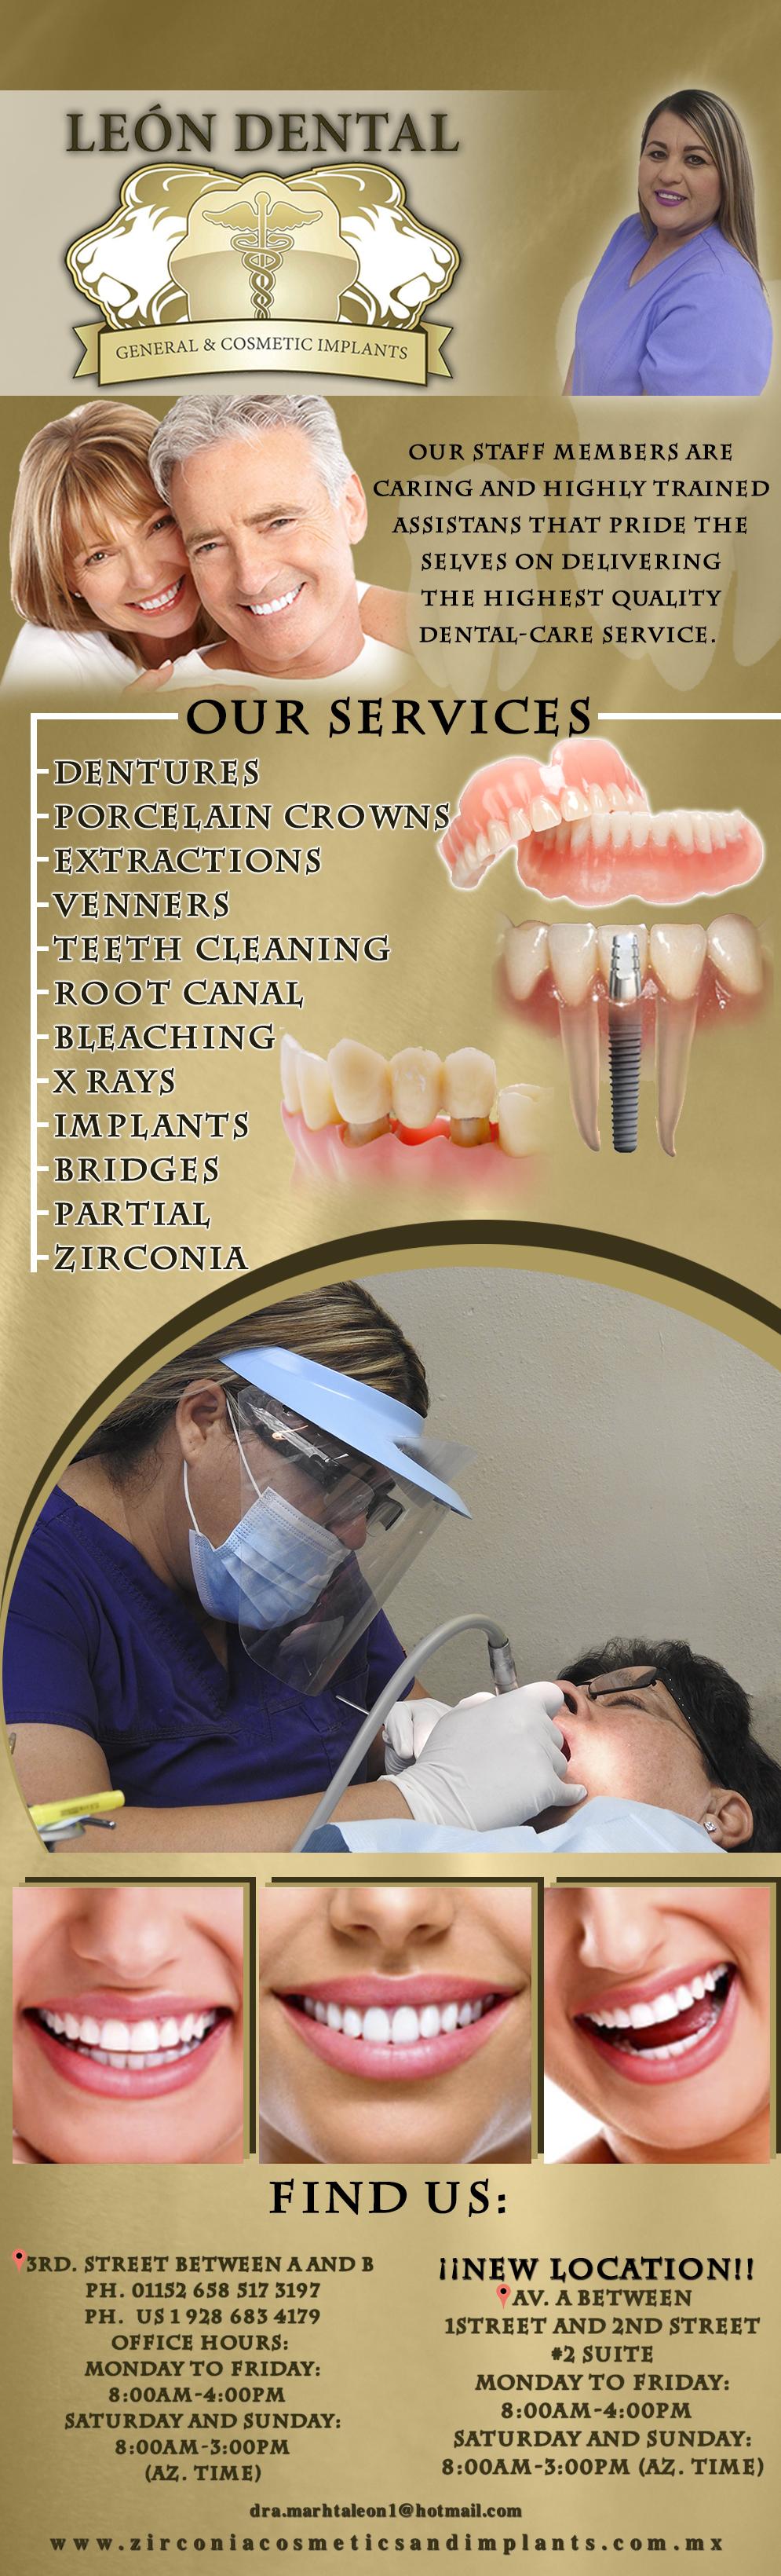 Leon Dental Martha Leon DDS in Algodones  in Algodones  LEON DENTAL All insurance Welcome...      leon dental clinic clinica dr dentis dentista martha alicia algodones